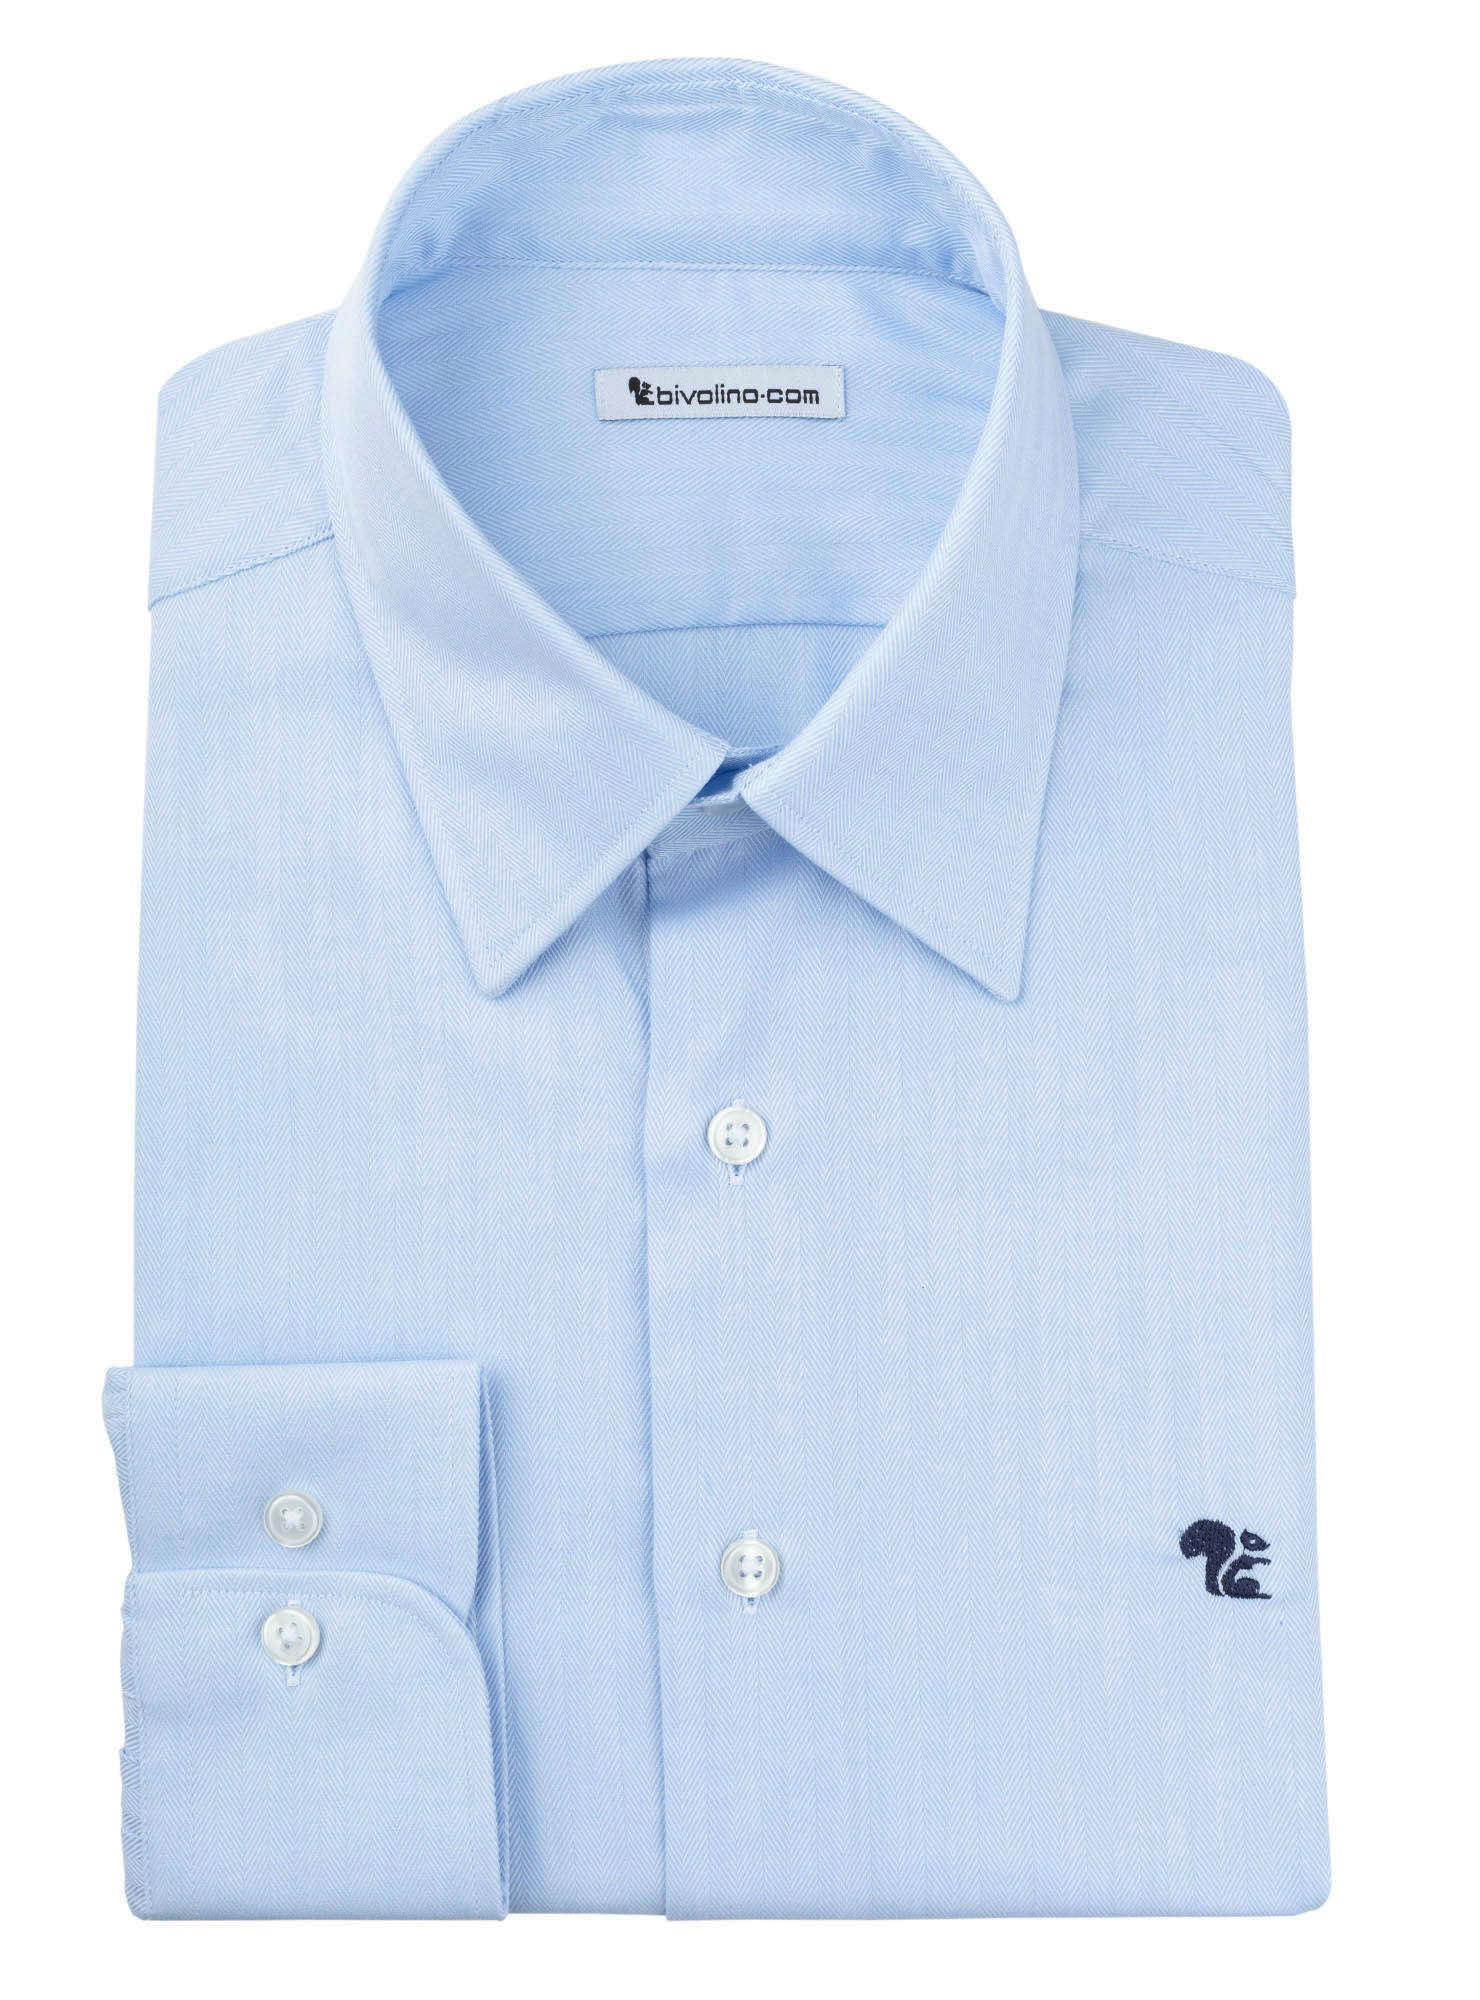 NOVARA - Visgraat overhemd  - Calvo 2 Malvern